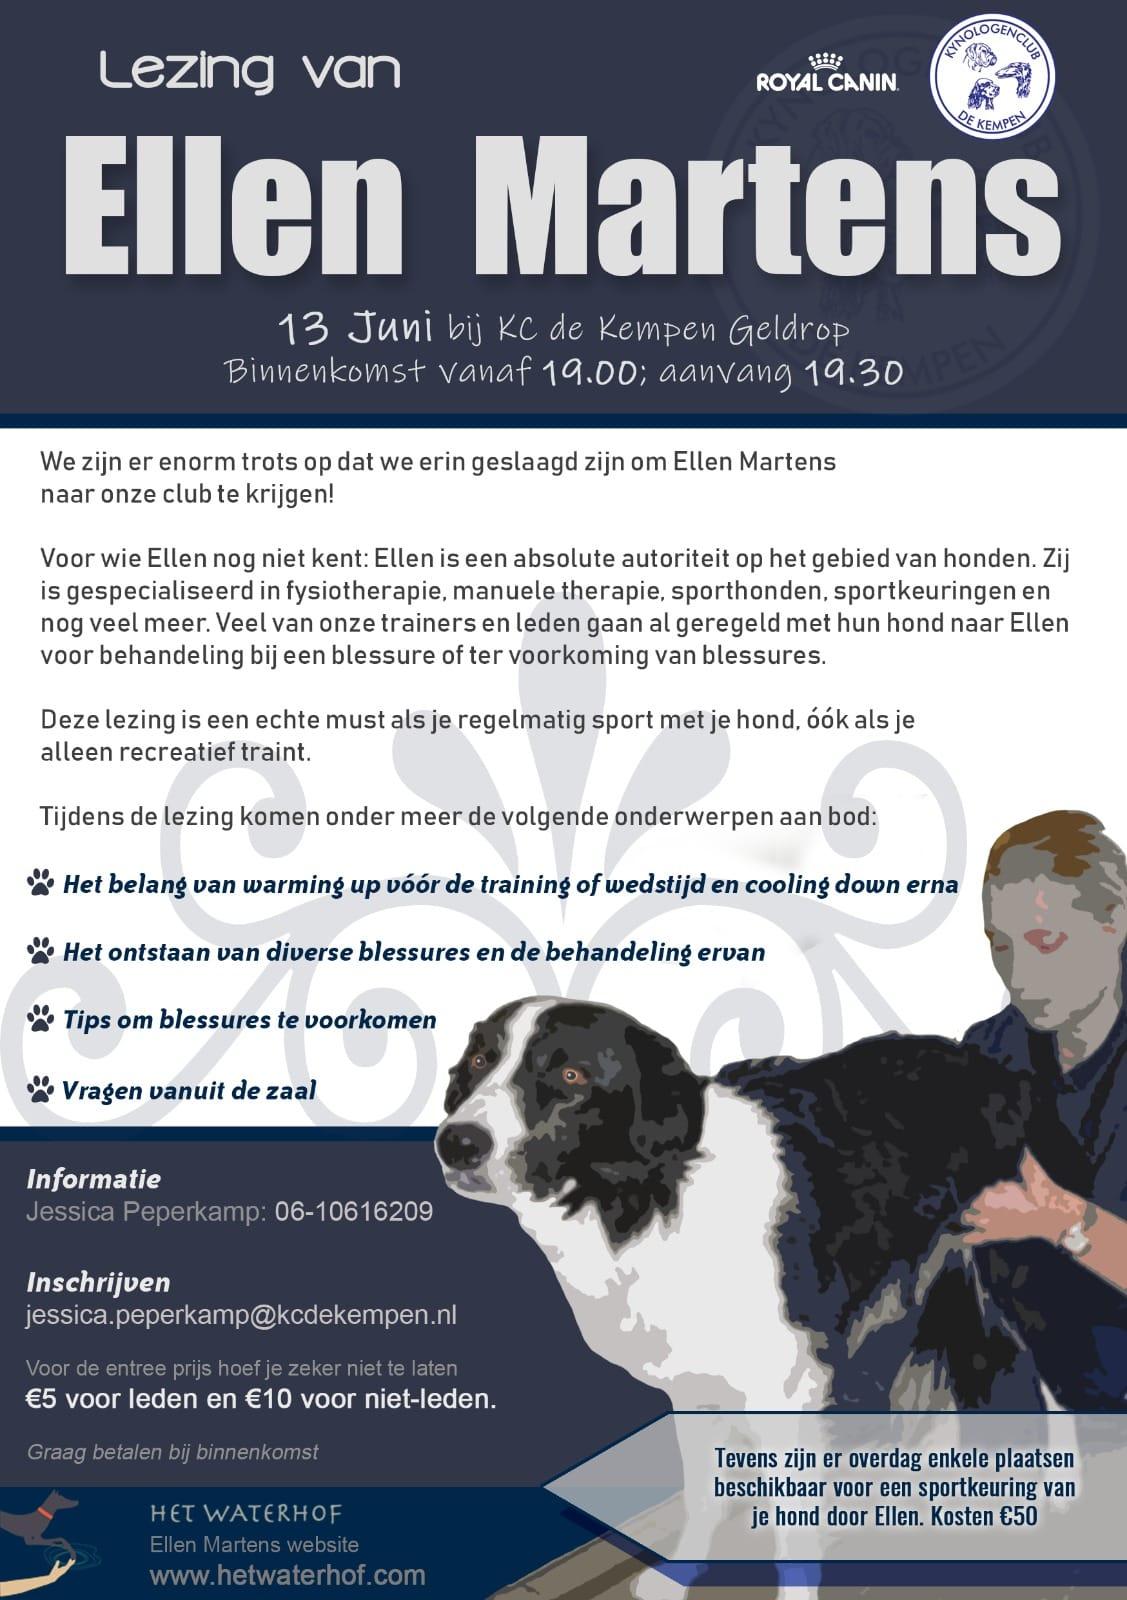 Lezing van Ellen Martens